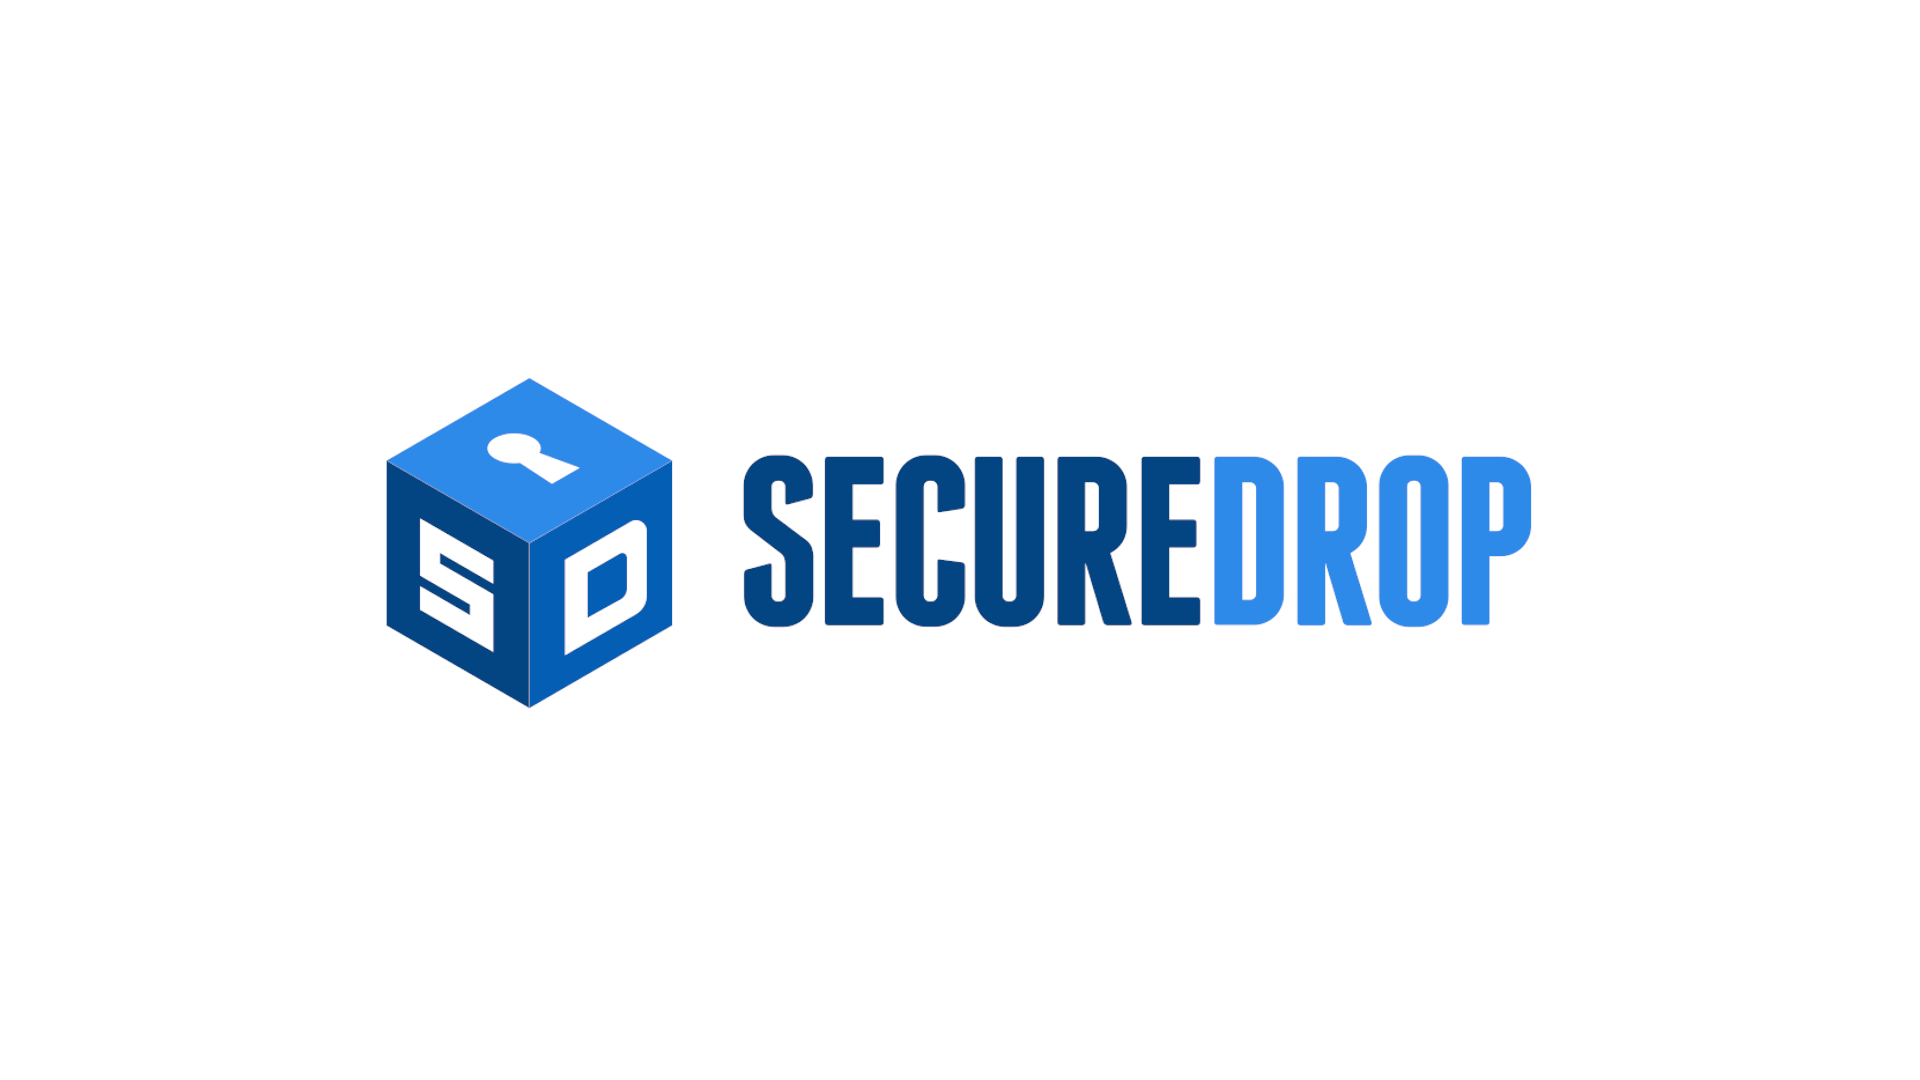 SecureDrop at OCCRP - OCCRP